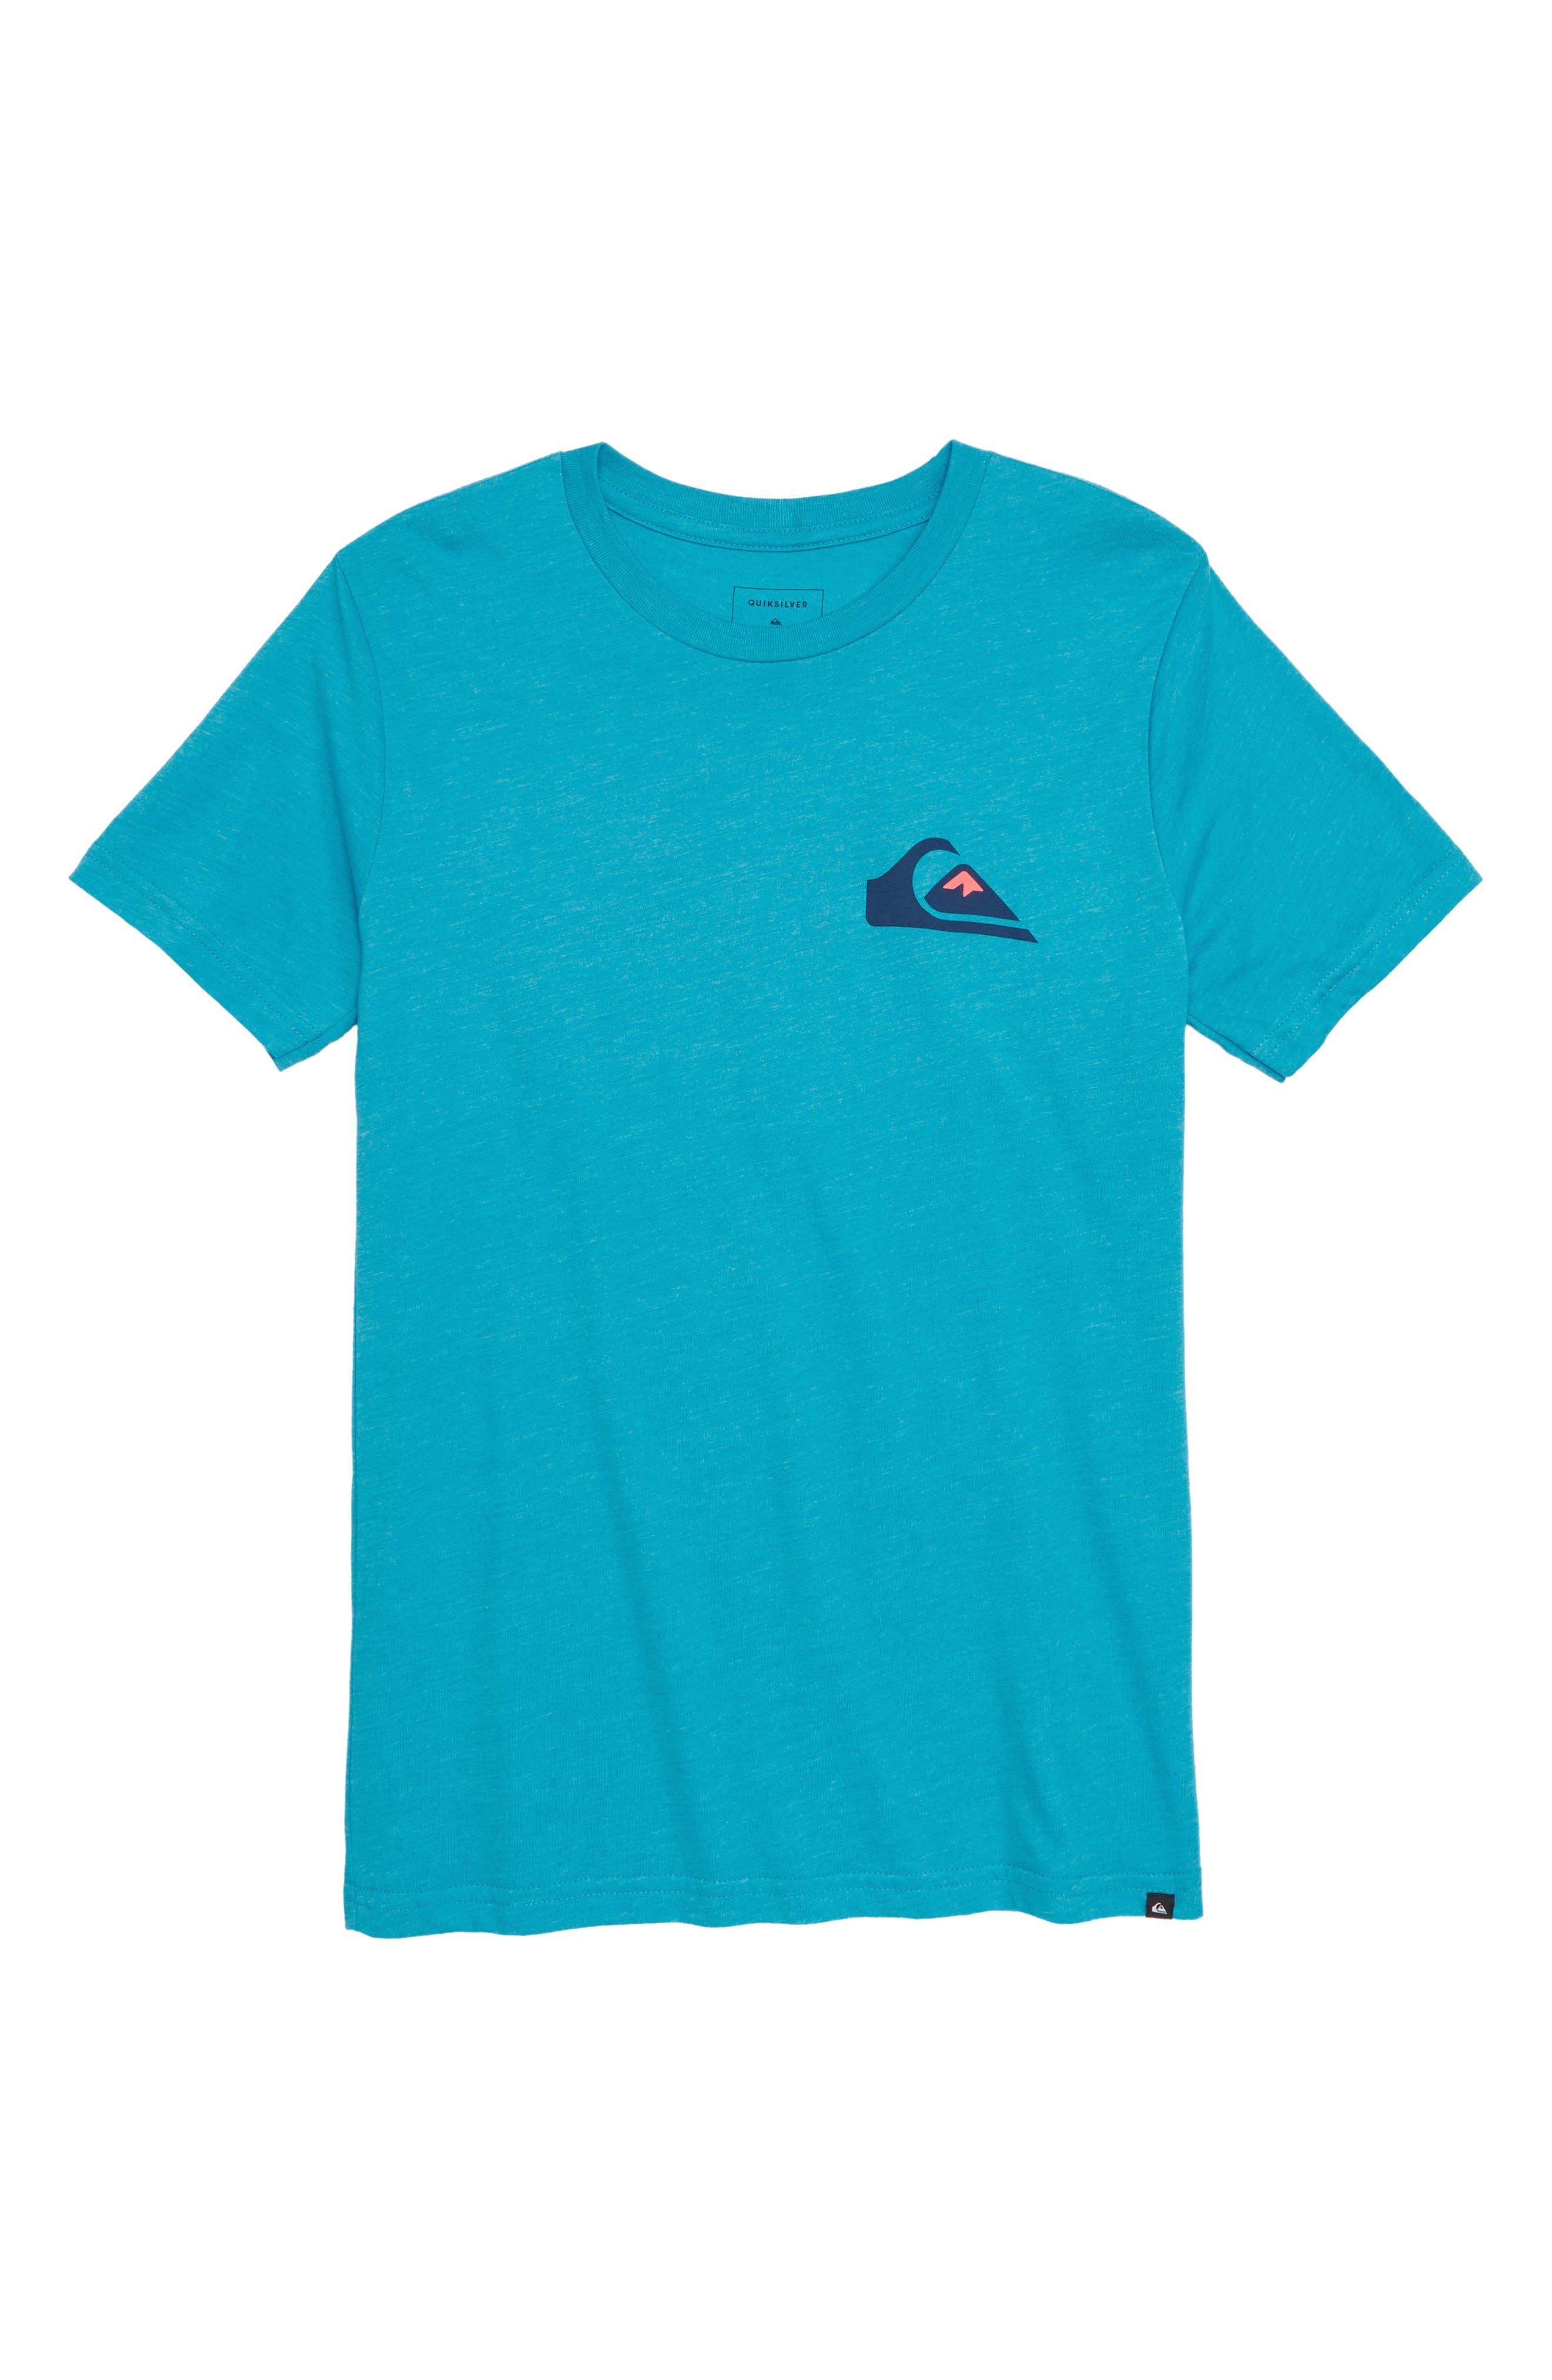 Vice Versa Graphic T-Shirt,                             Main thumbnail 1, color,                             Typhoon Heather